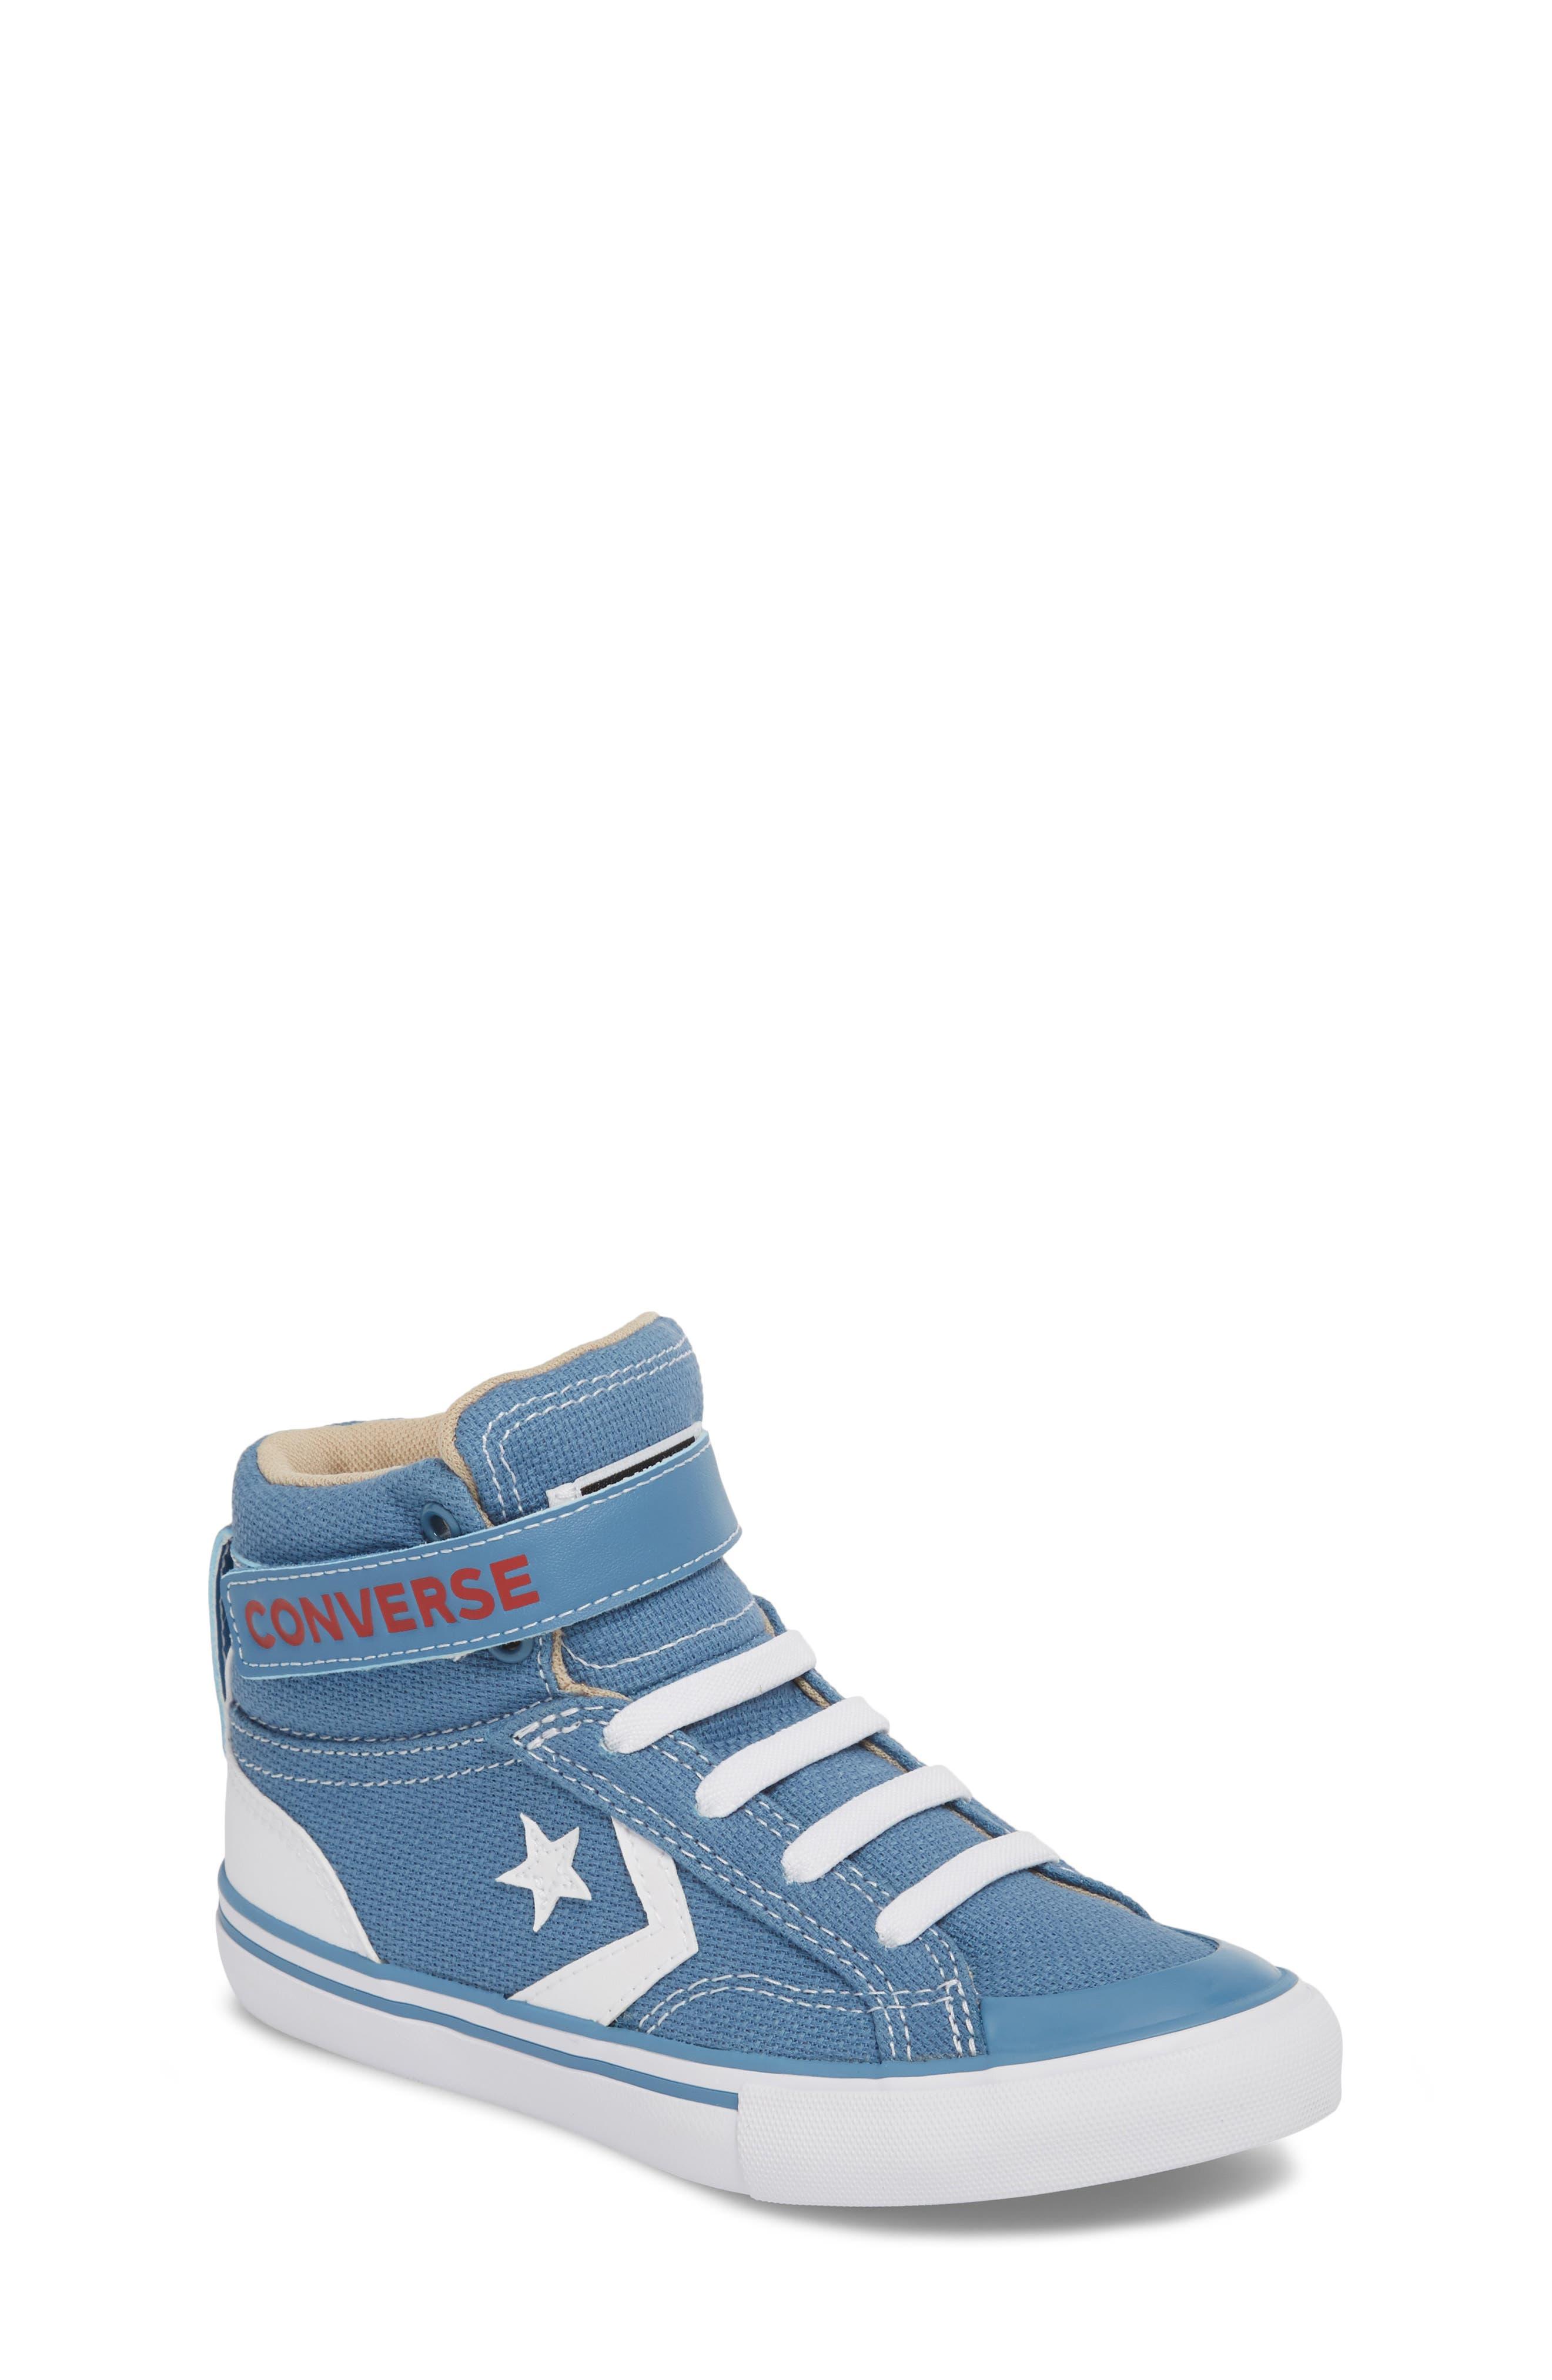 Alternate Image 1 Selected - Converse Pro Blaze High Top Sneaker (Toddler, Little Kid & Big Kid)